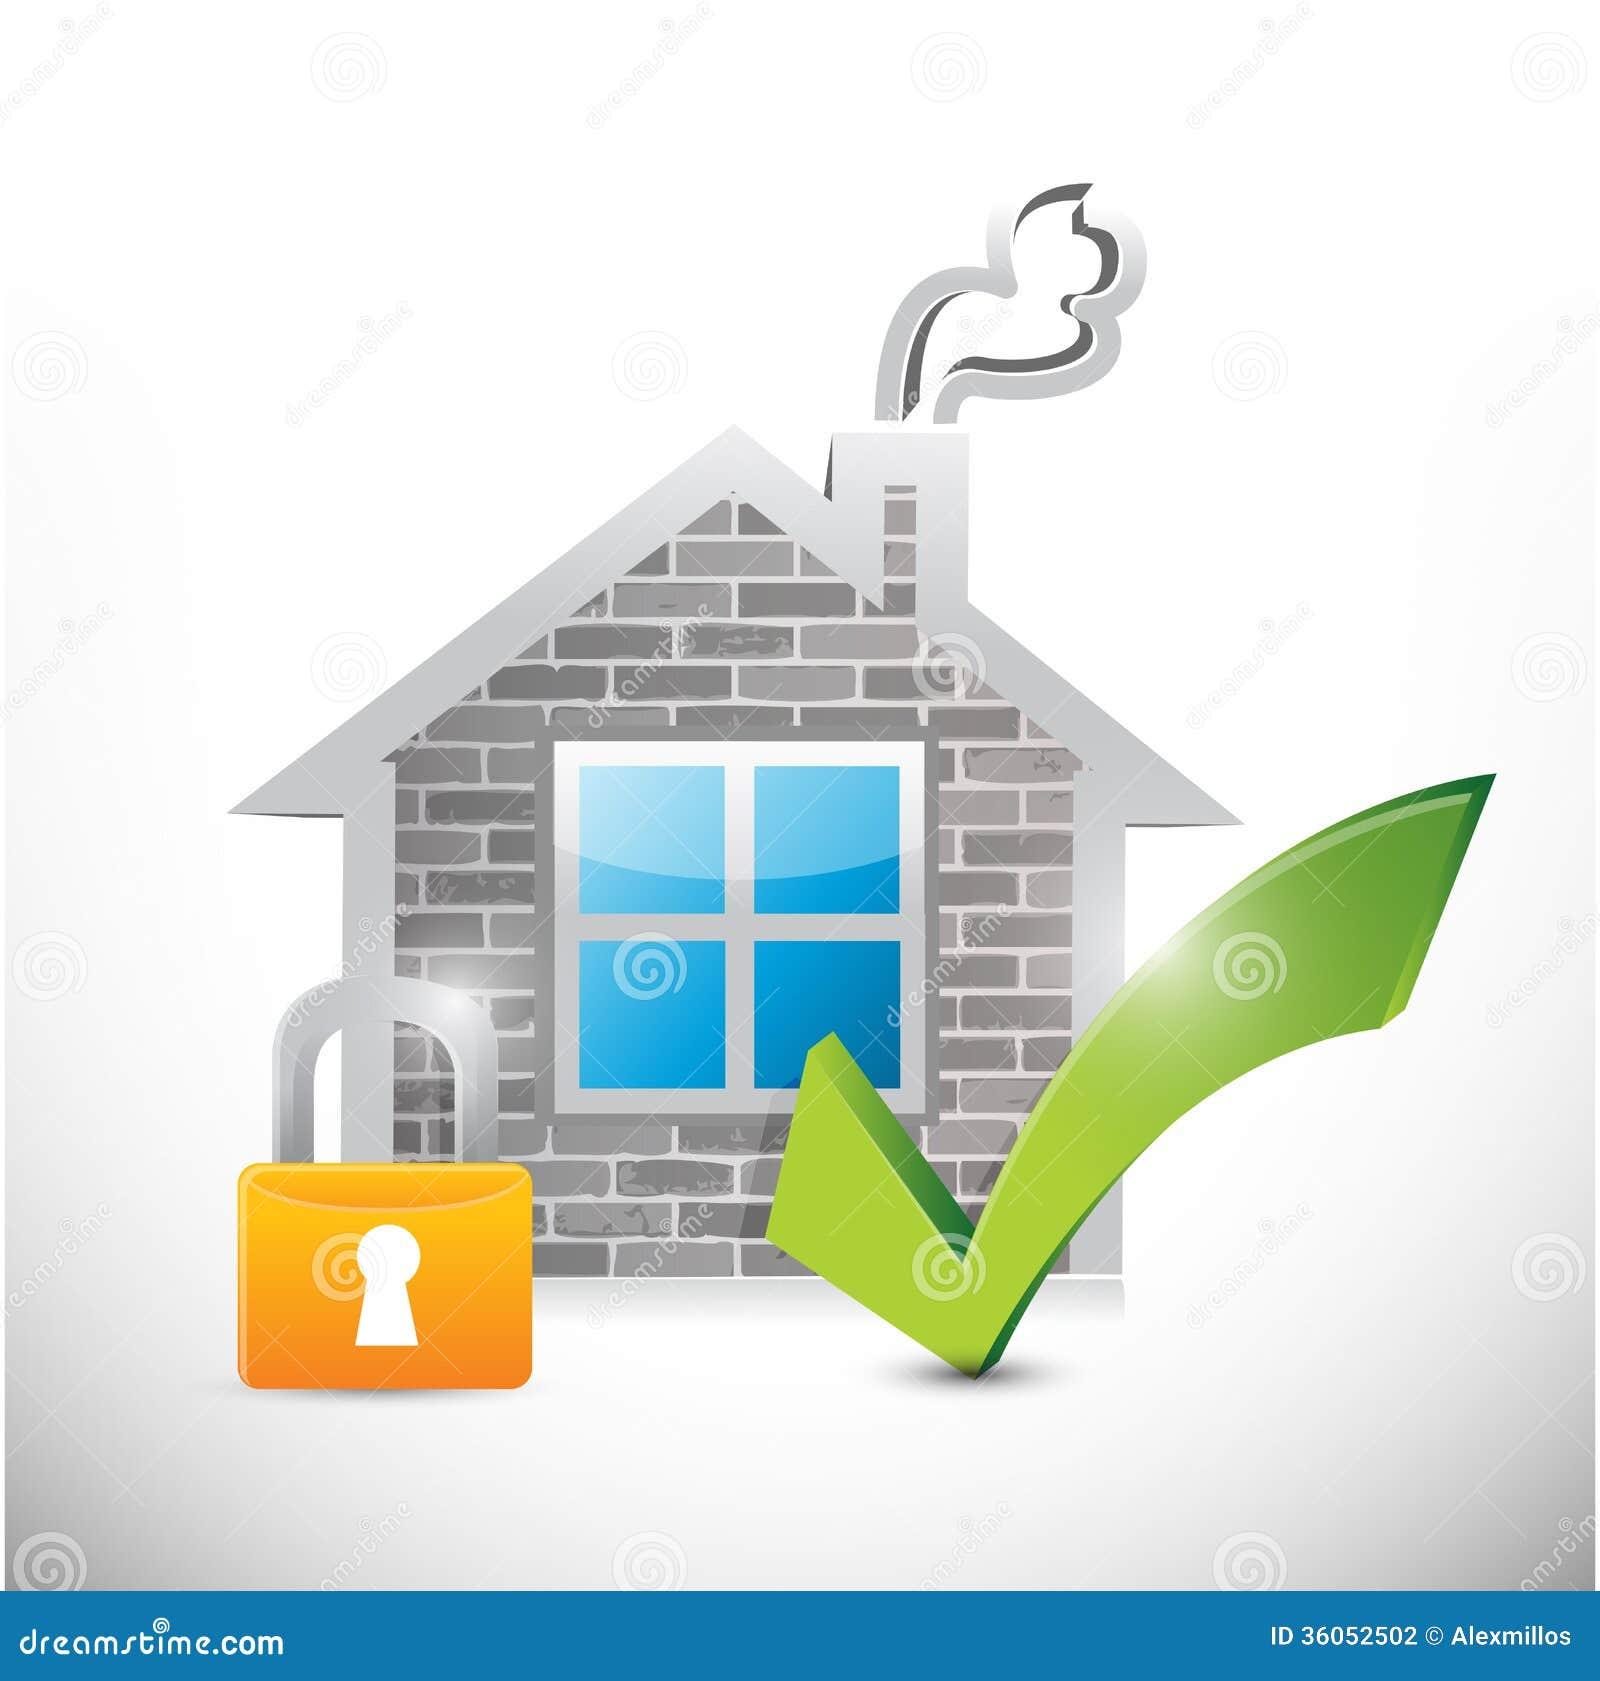 Secure Home Illustration Design Stock Illustration - Illustration of on software architecture, new england architecture, portfolio design architecture,